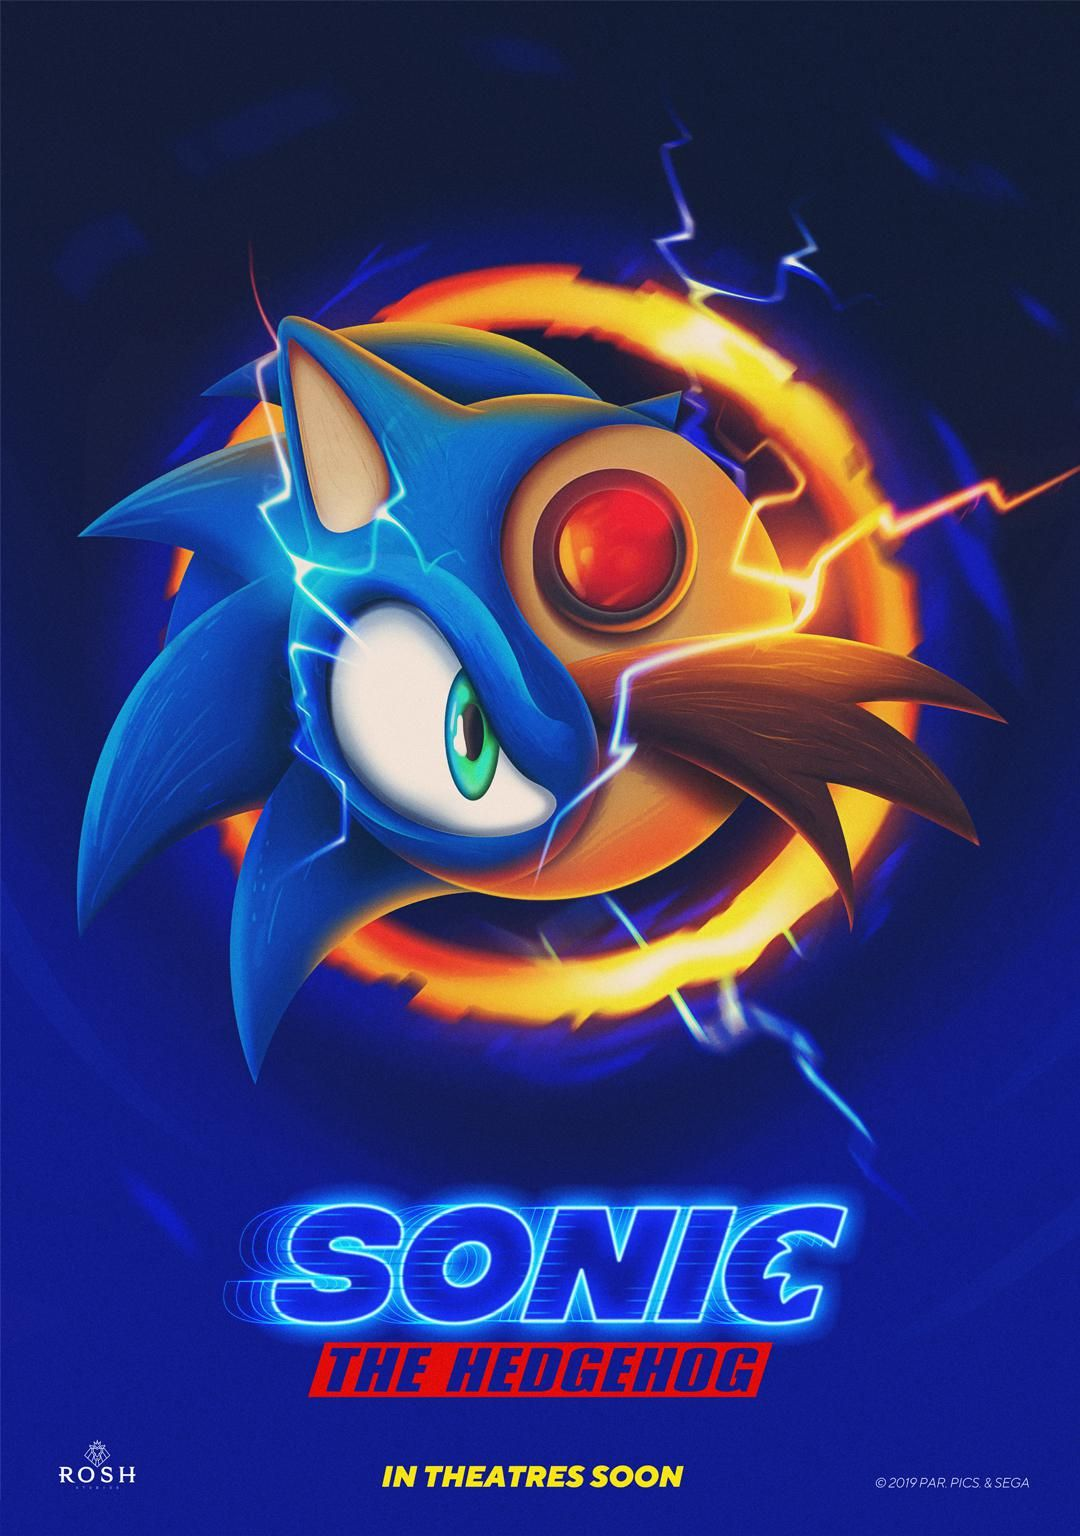 Sonic The Hedgehog 2020 1080 X 1536 In 2020 Sonic The Hedgehog Sonic Hedgehog